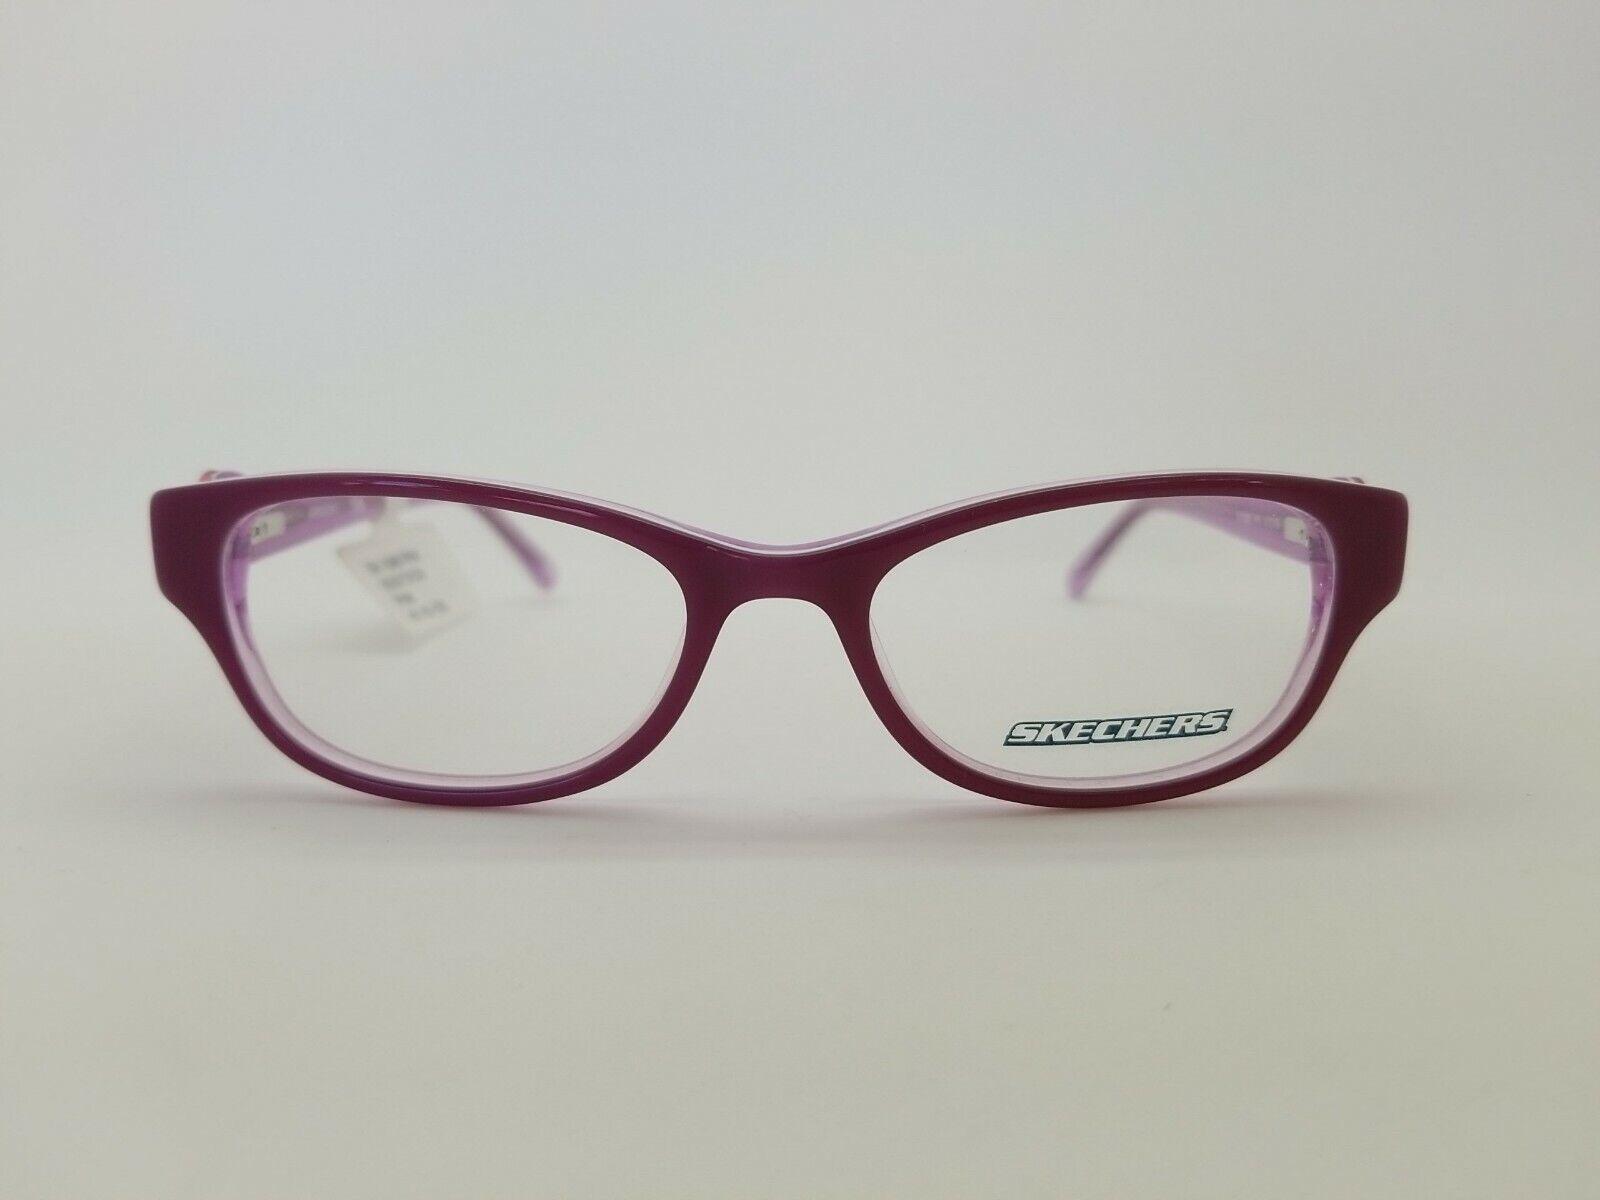 1 Unit NEW Skechers RX Ready Pink Prescription Eyeglasses Frame 47-16-130 #211